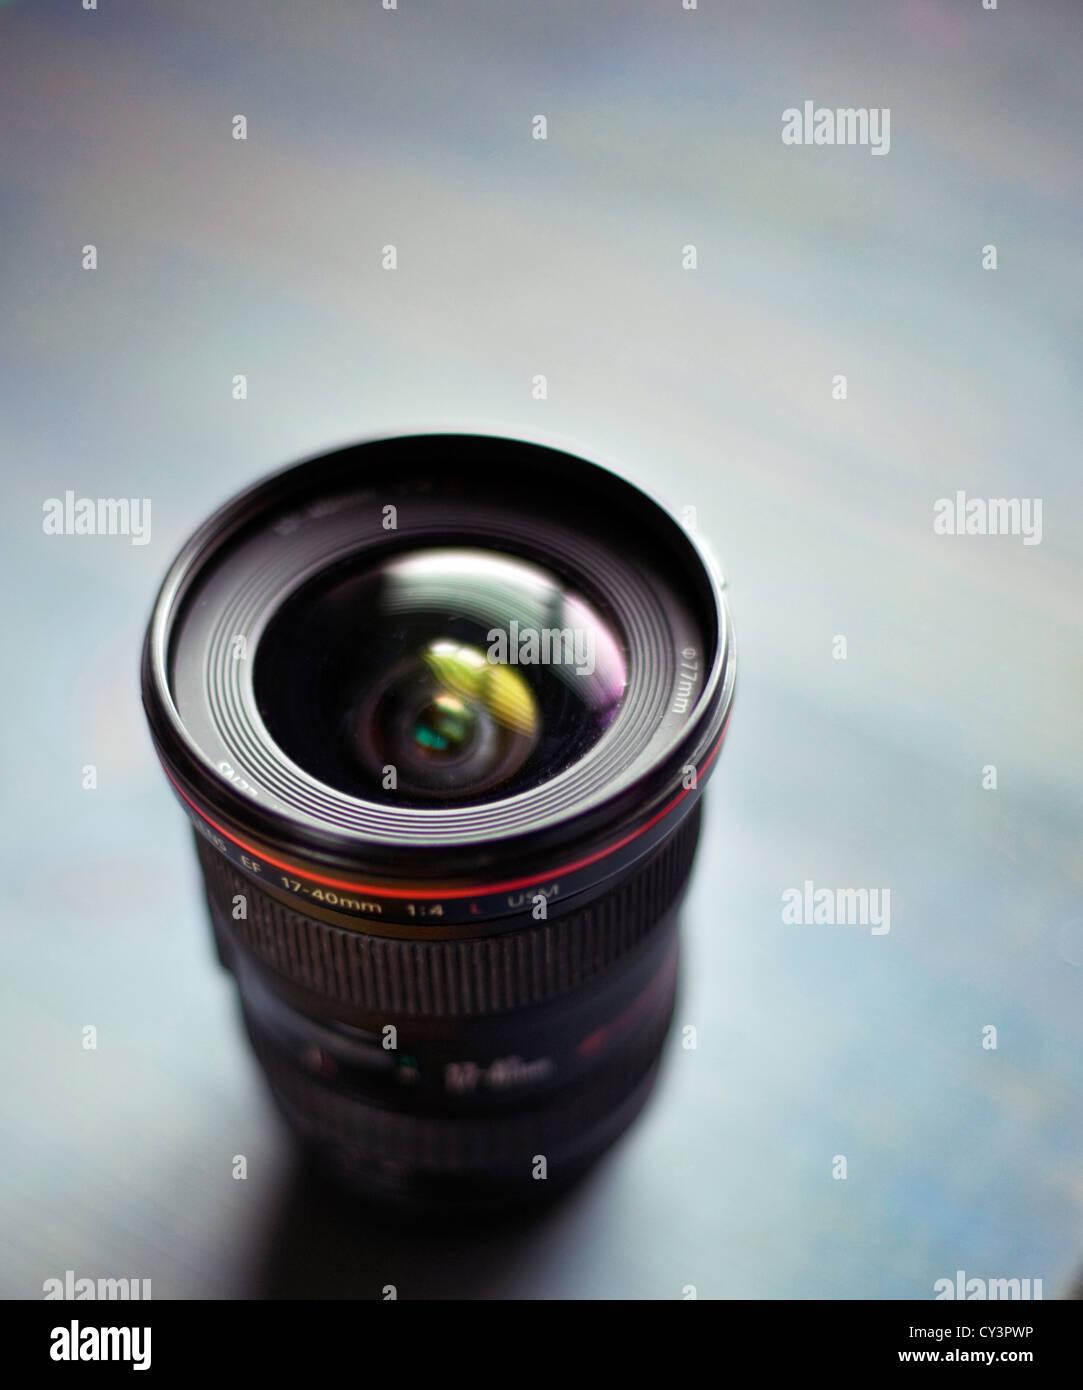 Usm Stockfotos & Usm Bilder - Alamy